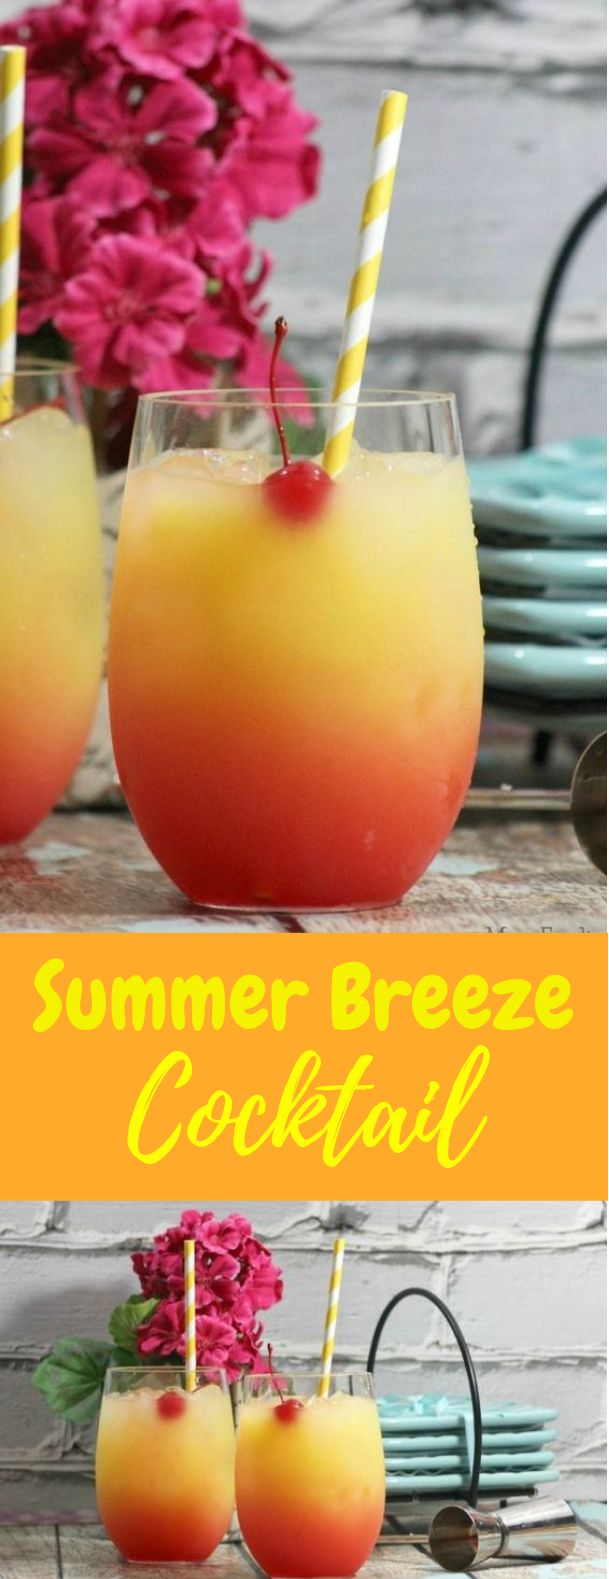 Summer Breeze Cocktail Recipe #Summer #Cocktail